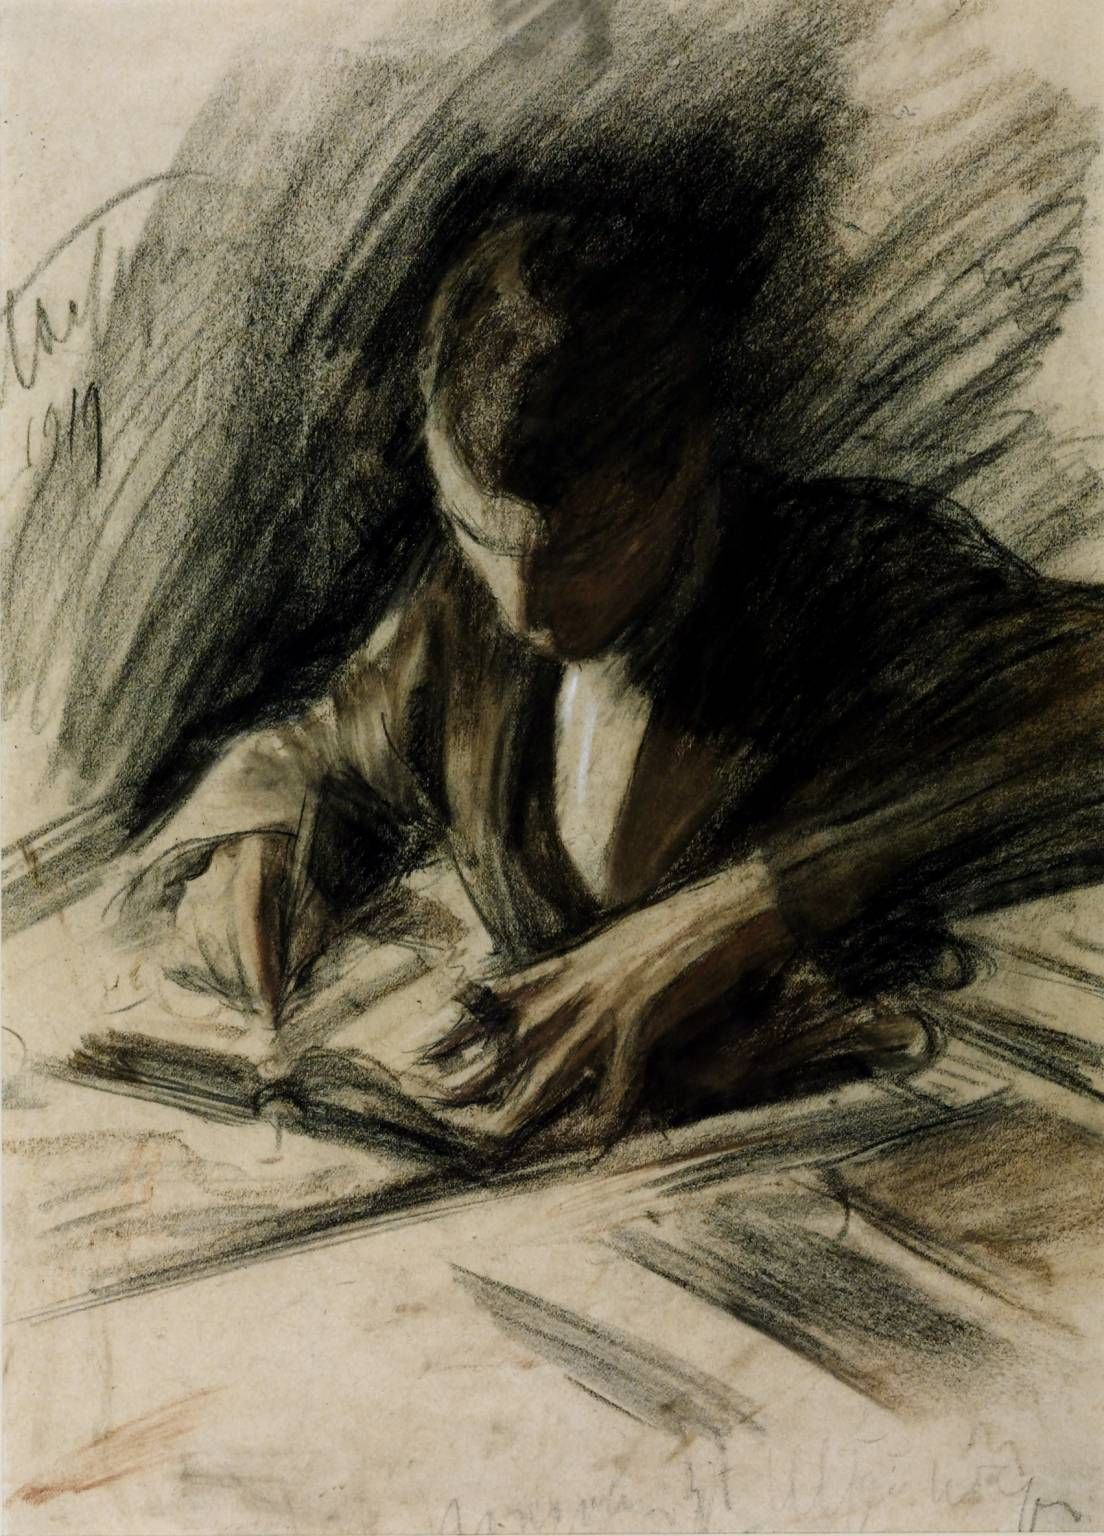 Boris Pasternak writing, by Leonid Pasternak, 1919